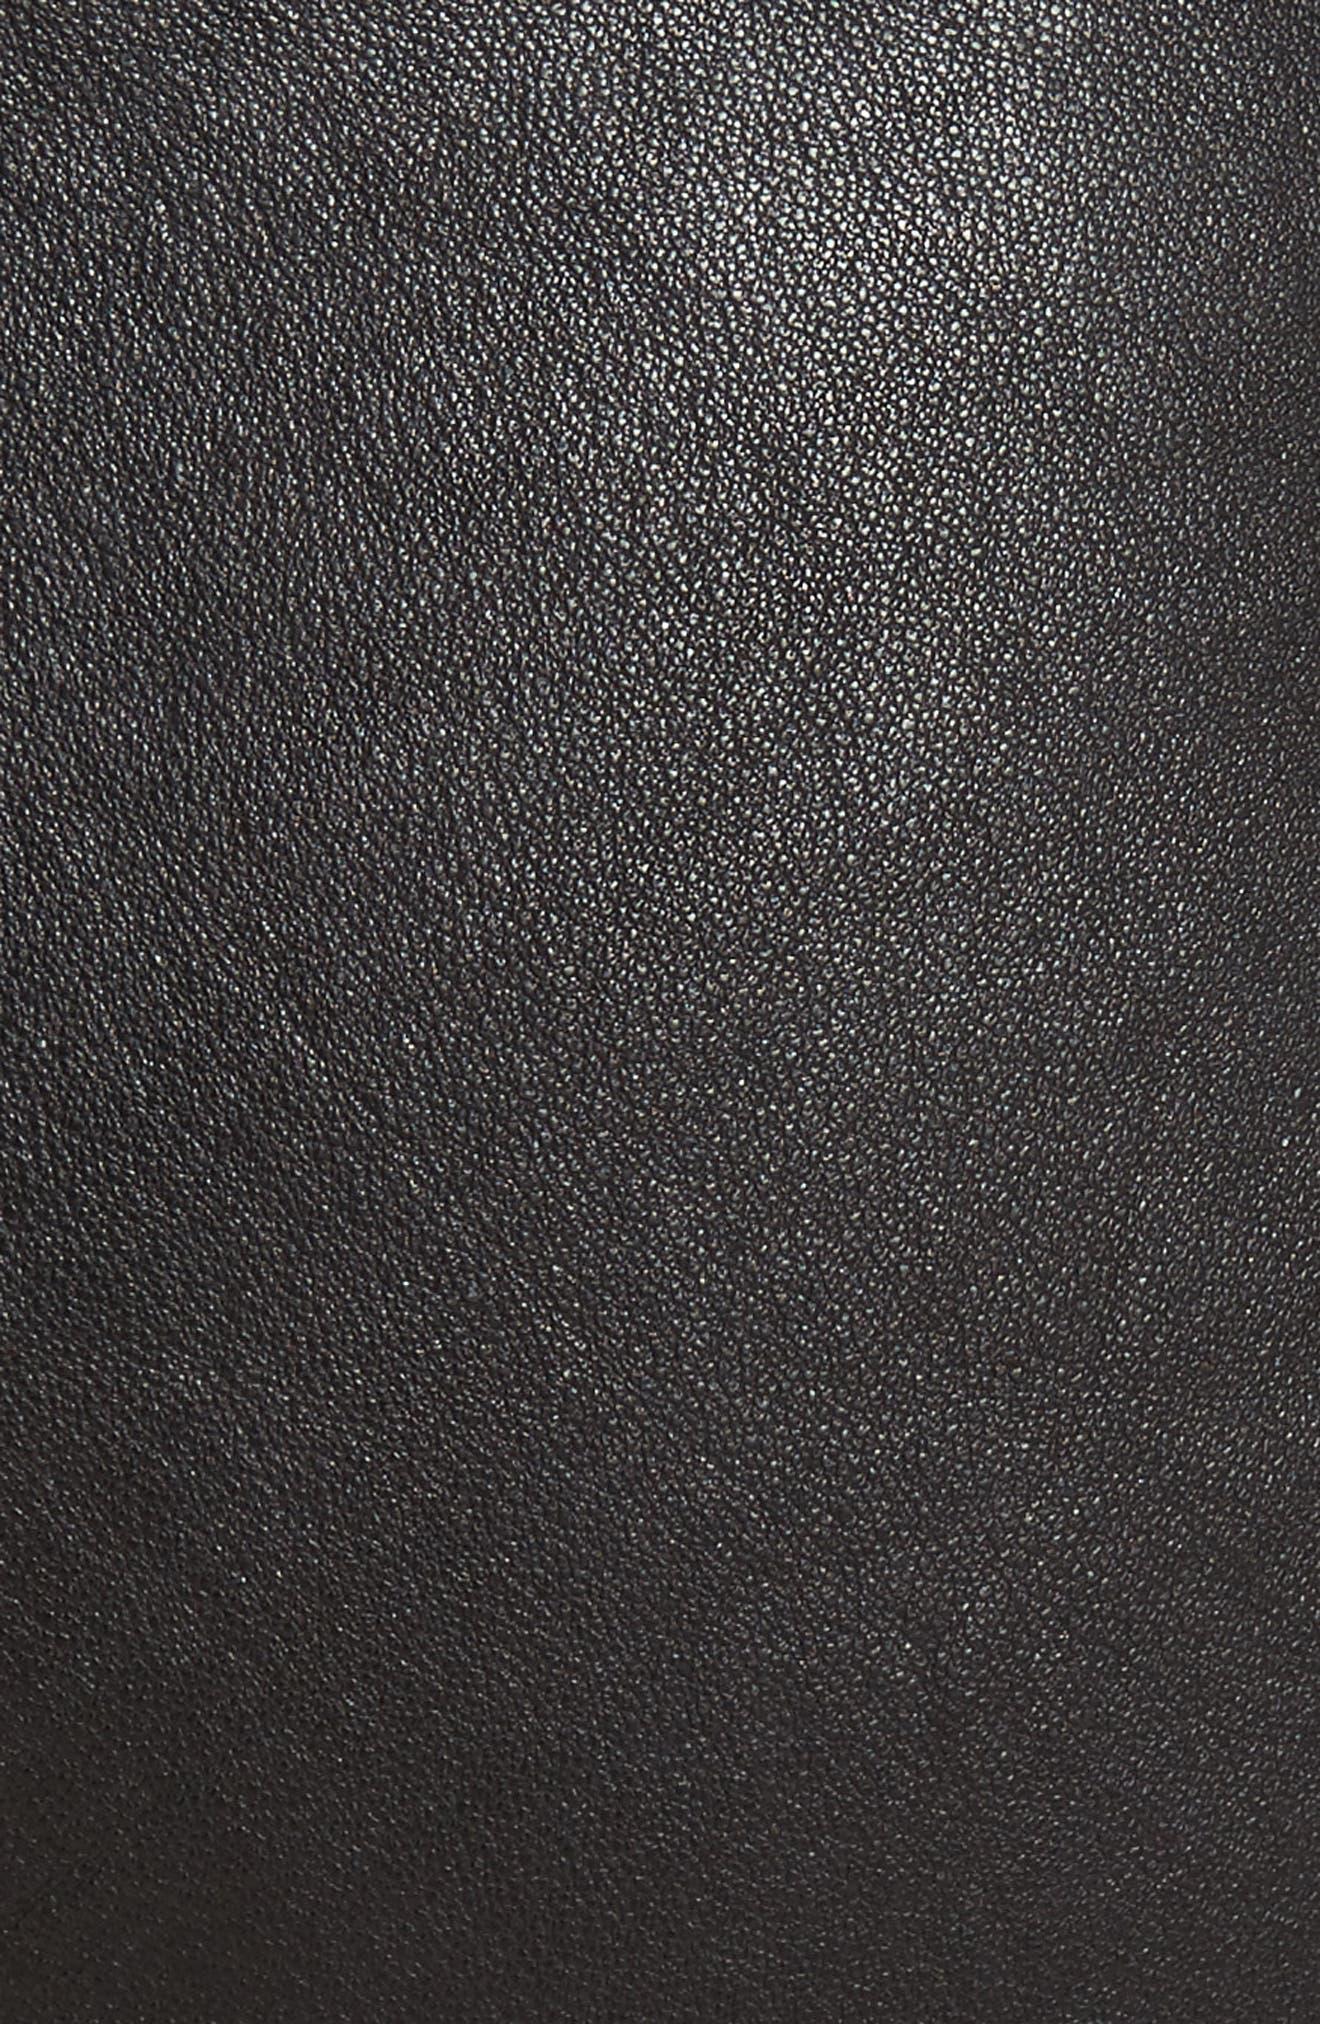 ALICE + OLIVIA, Leather Leggings, Alternate thumbnail 6, color, BLACK